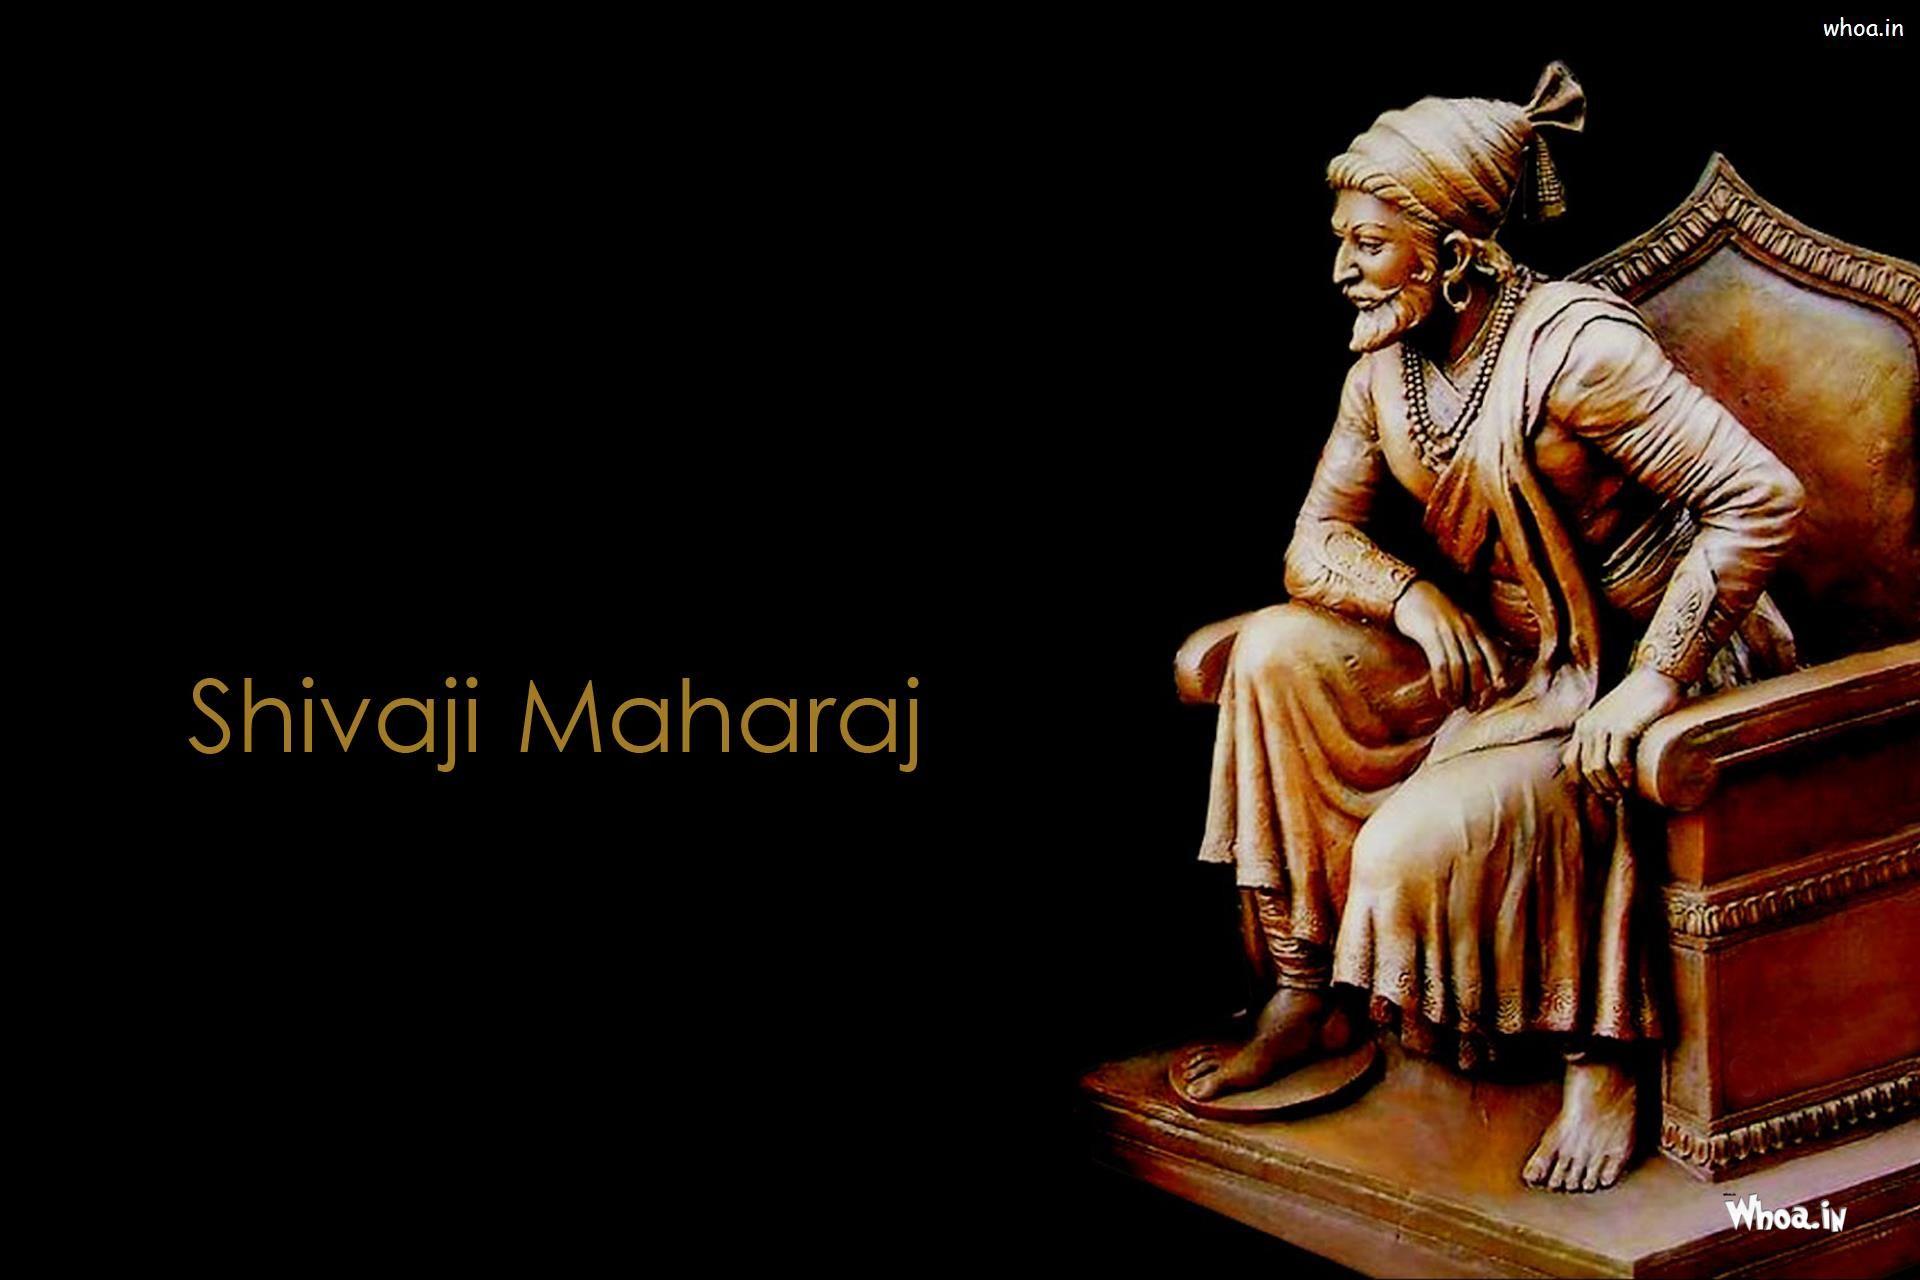 Chatrapati Shivaji Maharaj Hd Pic: Image Result For Shivaji Maharaj Photo Hd